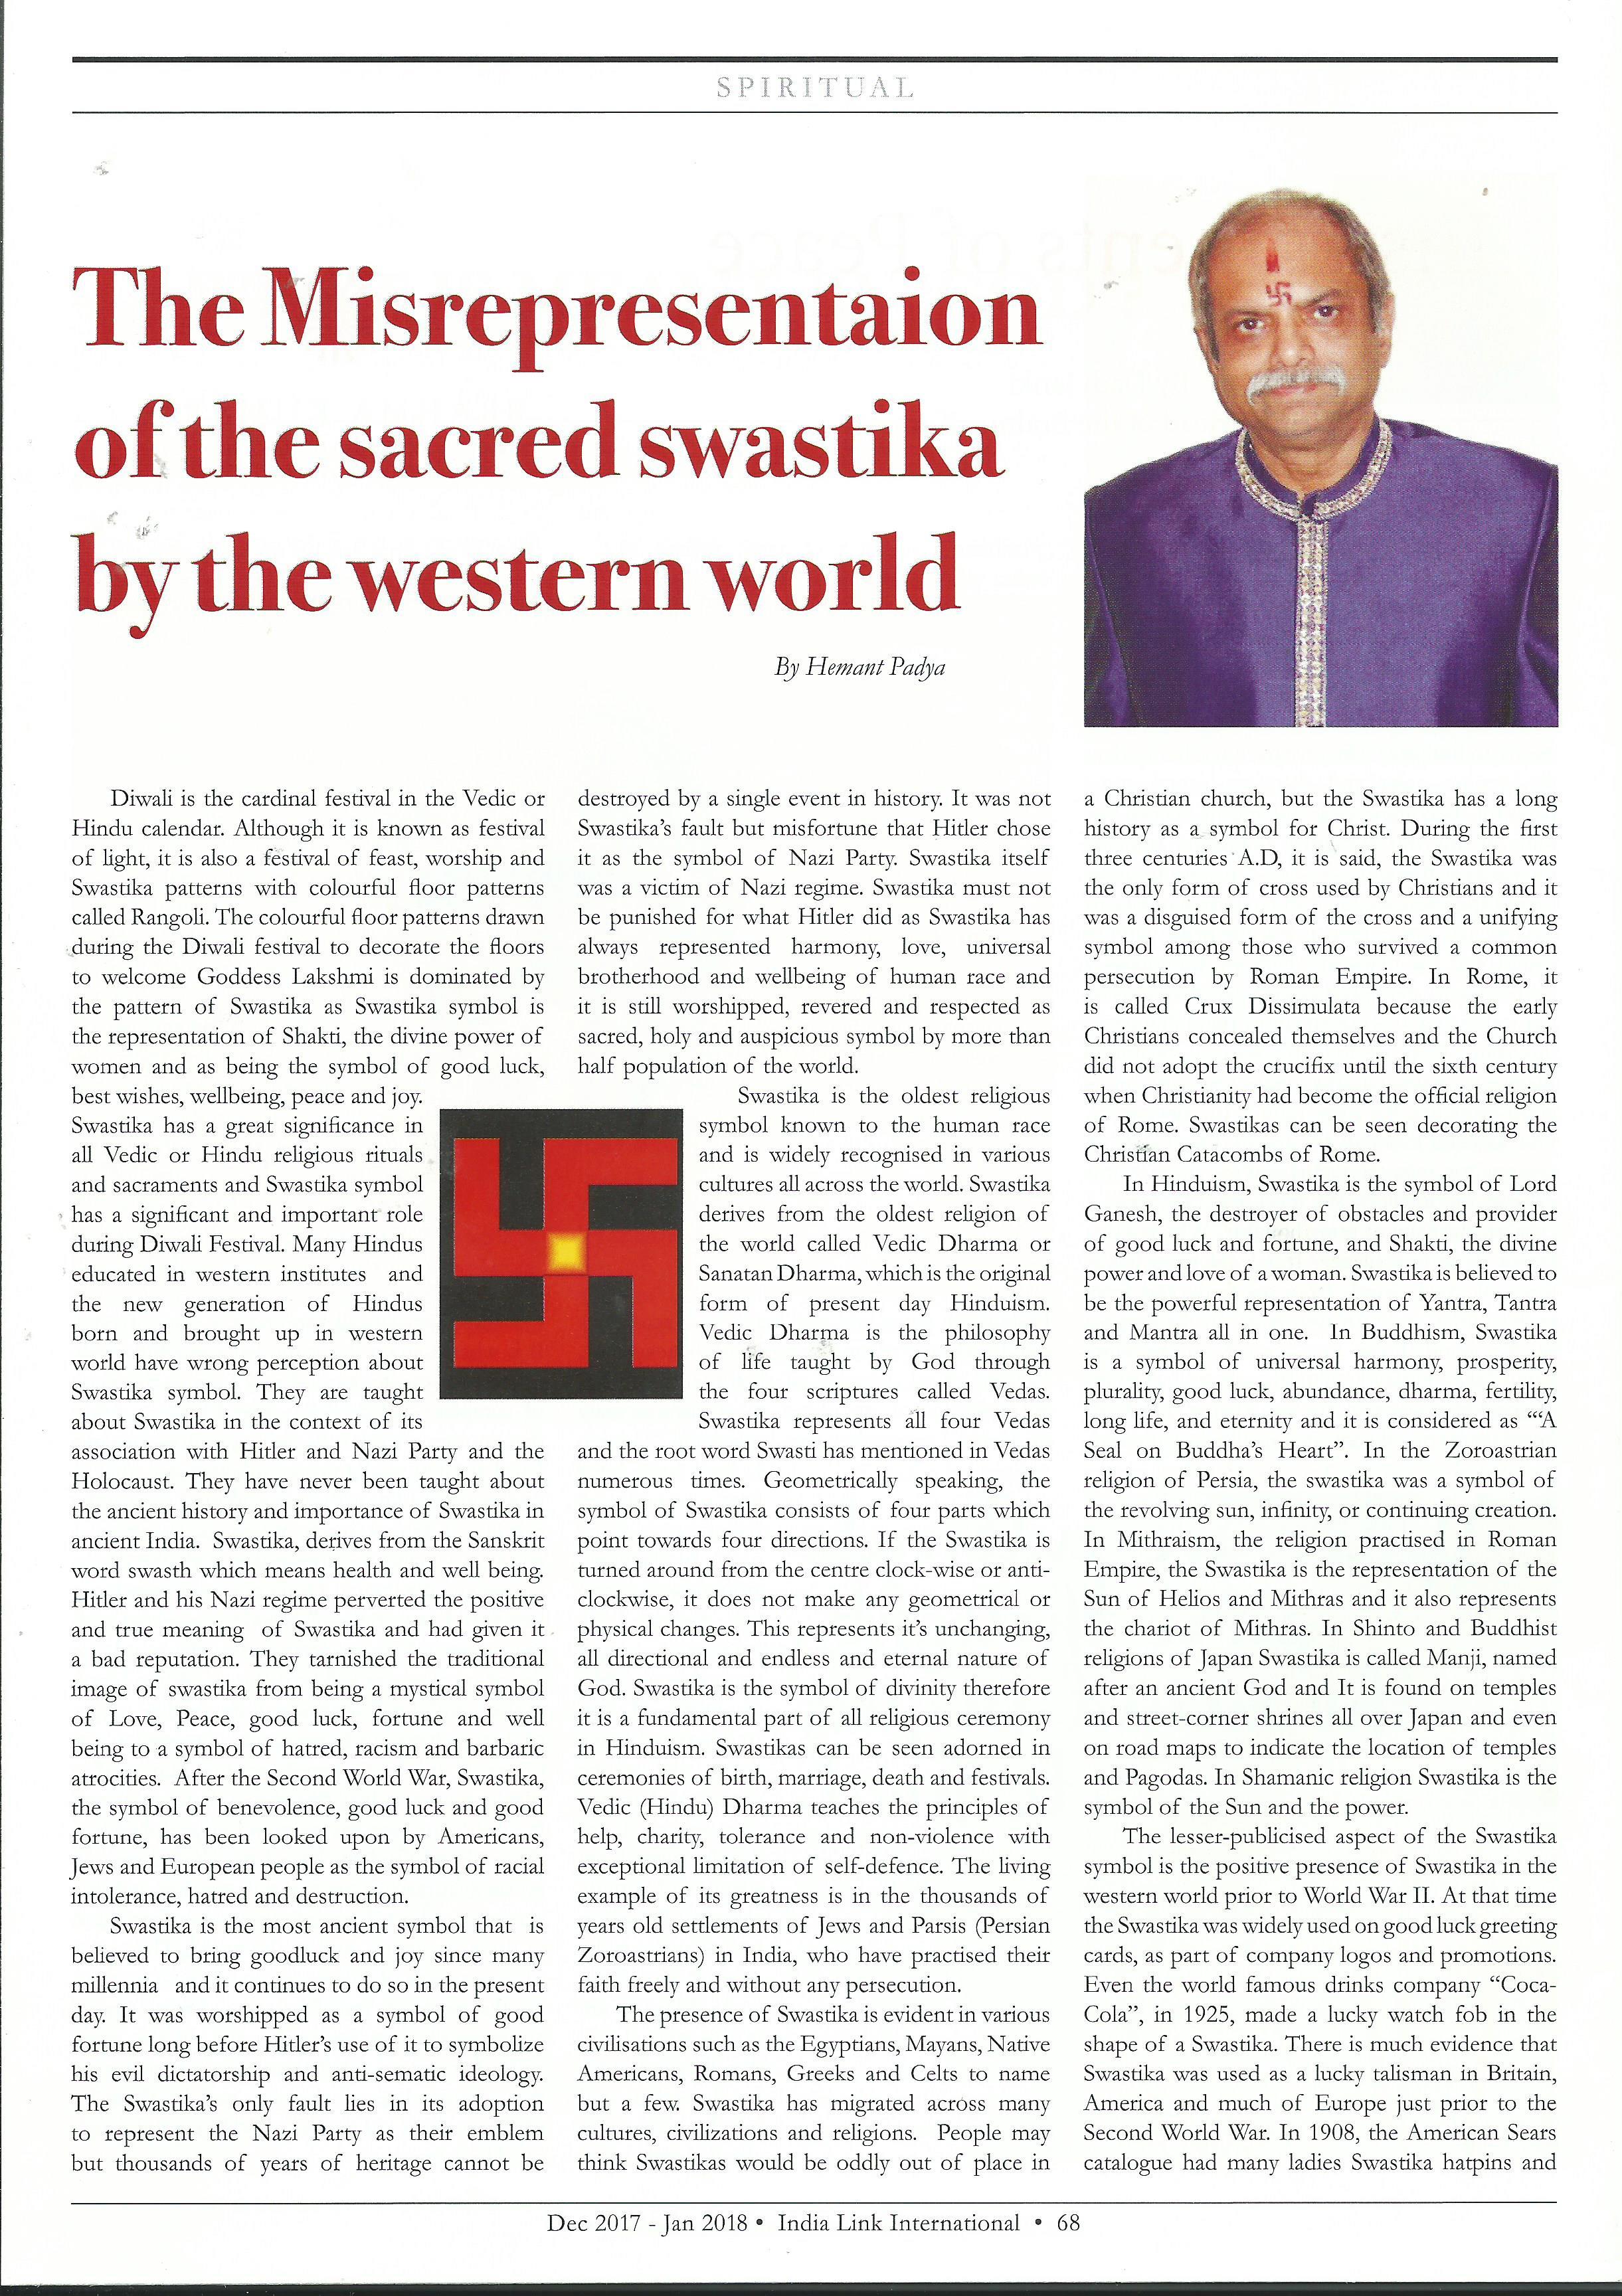 The Misrepresentation The Sacred Swastika By The Western World